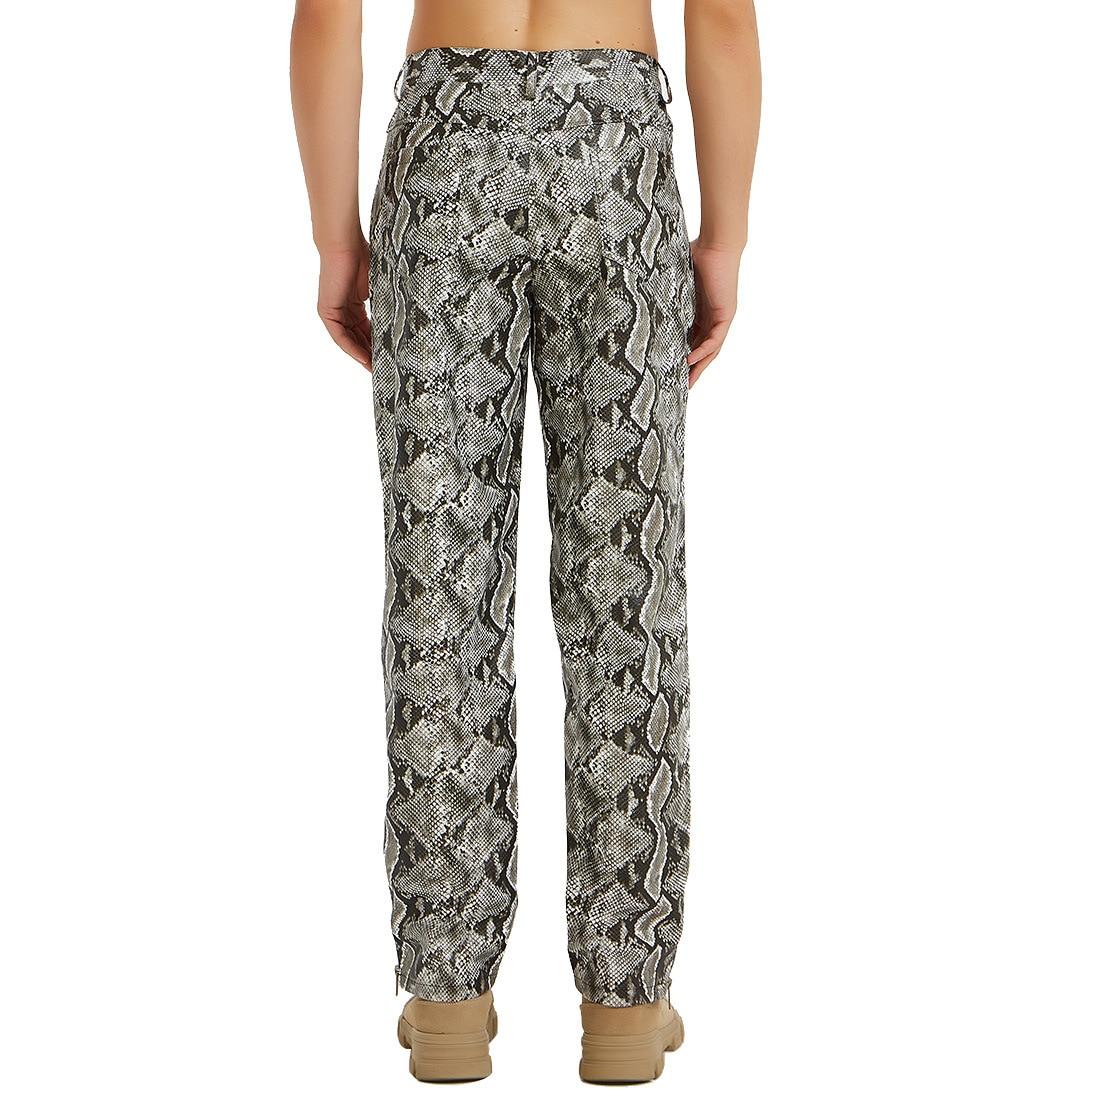 2019 New Style Ouma Casual Pants Snakeskin Print MEN'S PU Leather Pants Fashion Man Slim Fit Pants Jj-yk037